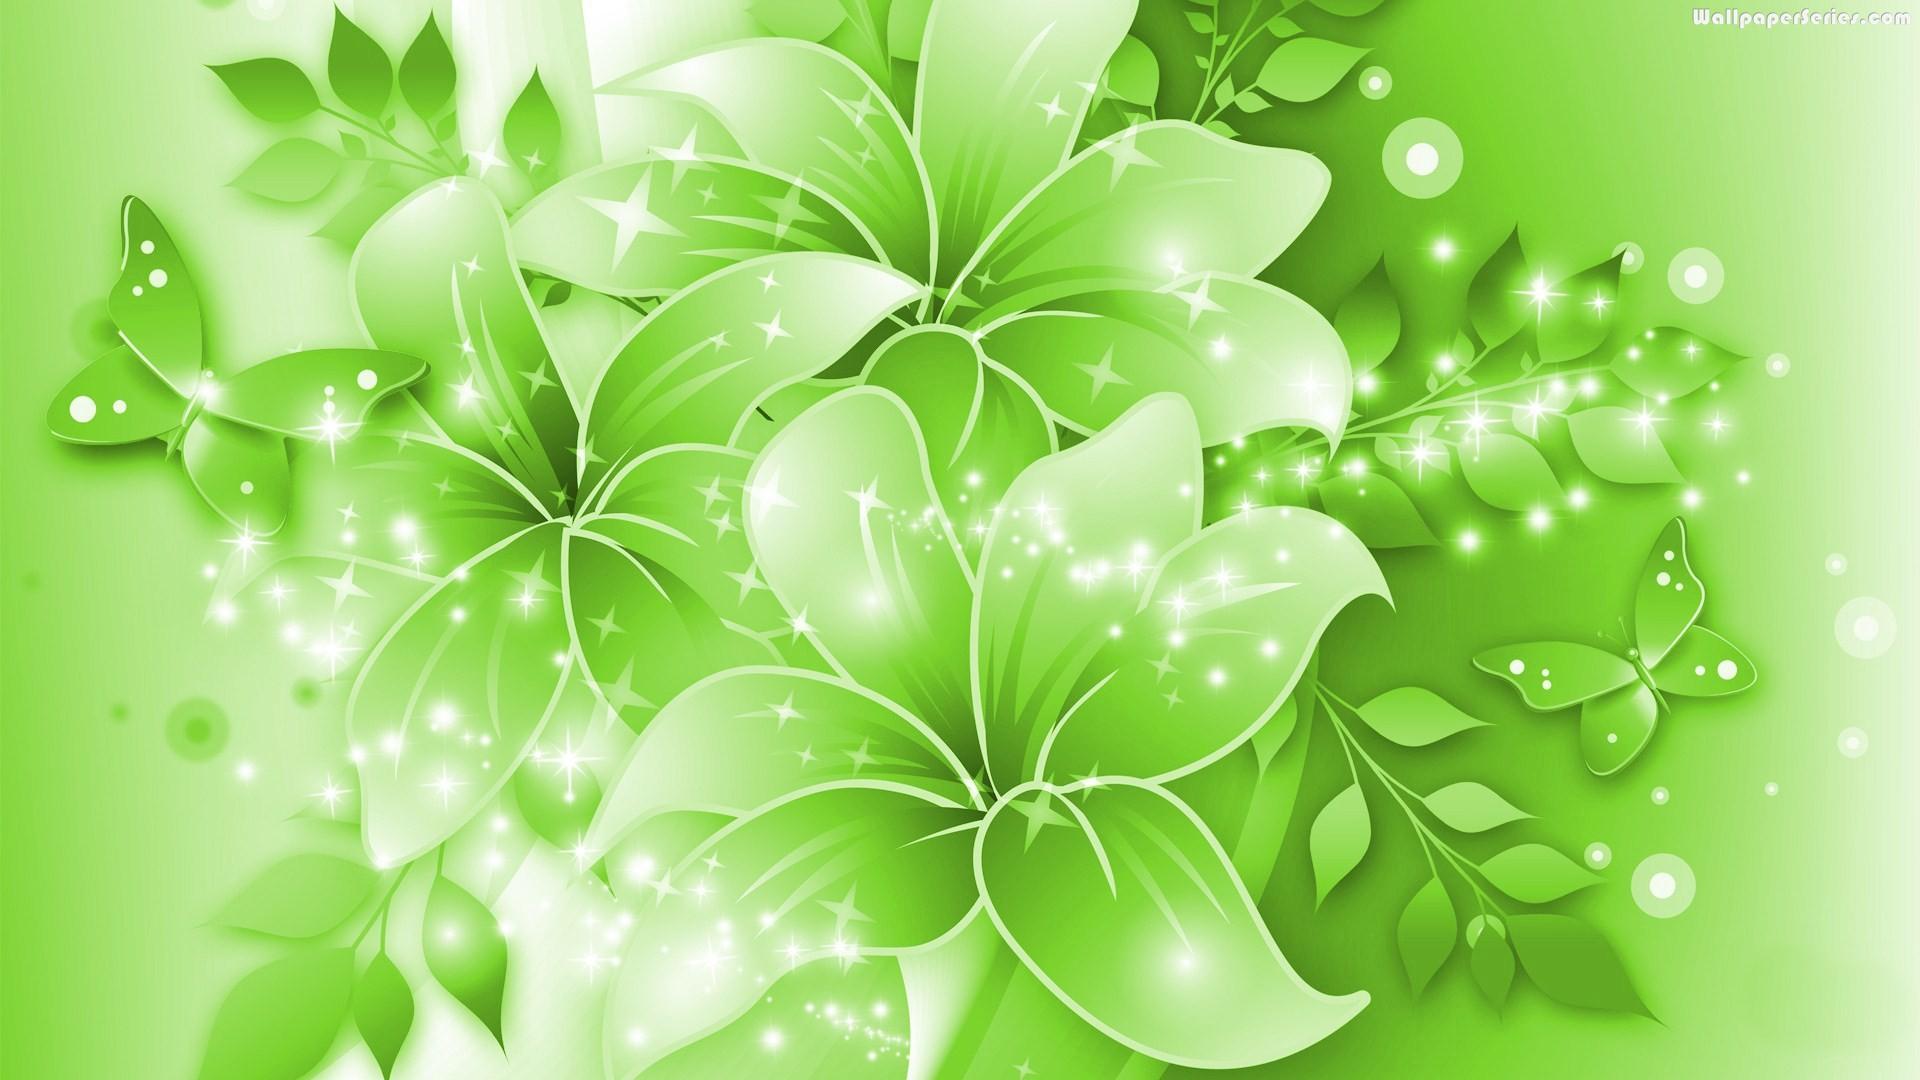 green flowers wallpaper 1 - photo #18